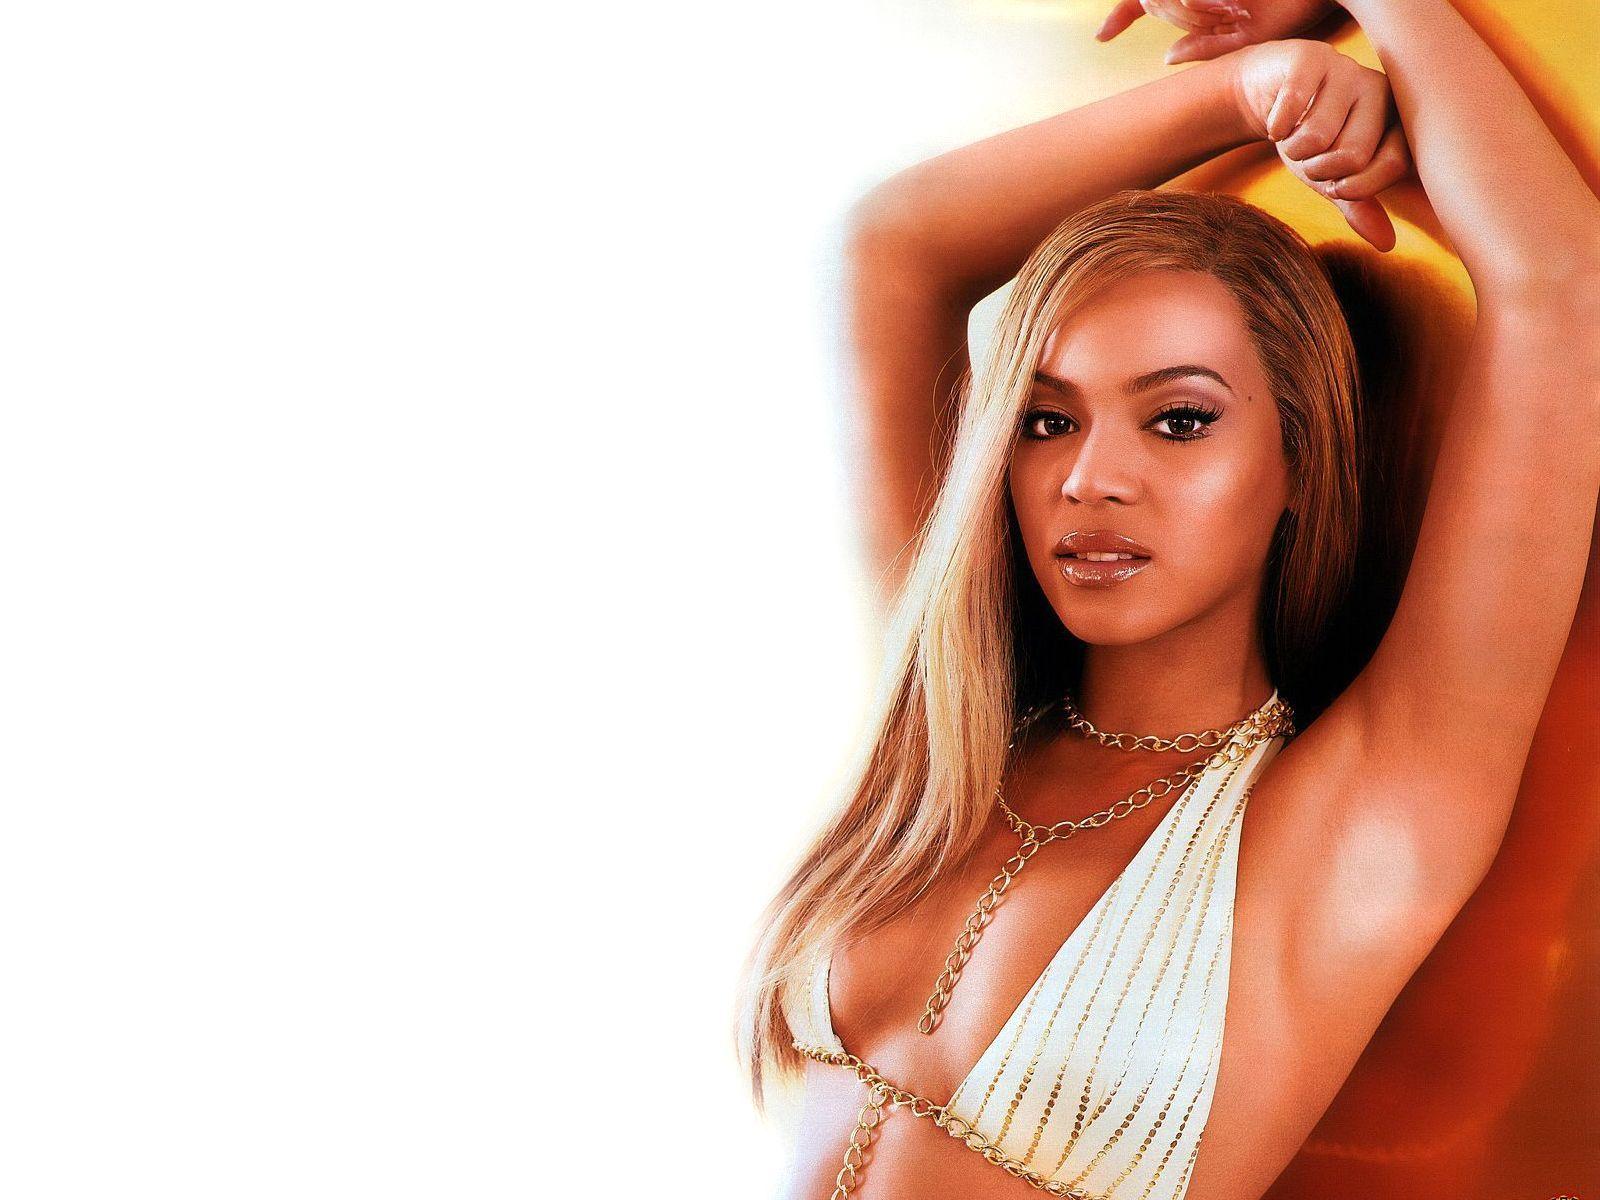 http://2.bp.blogspot.com/_Cs2VN3aqlHQ/S8pqFFq9EgI/AAAAAAAAB94/QIbNeL6Hi-g/s1600/Beyonce3.jpg